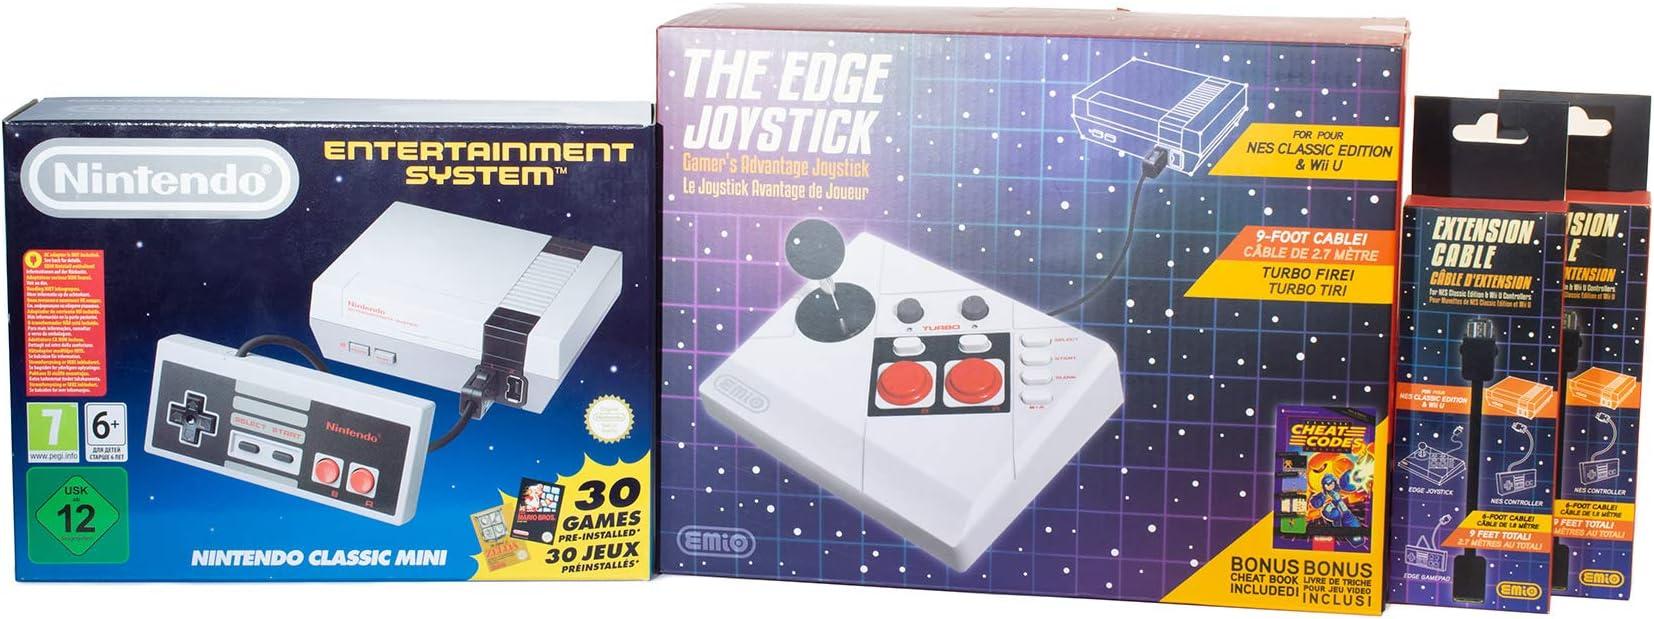 Amazon com: NES Classic Edition With Bonus Joystick + 2 Free